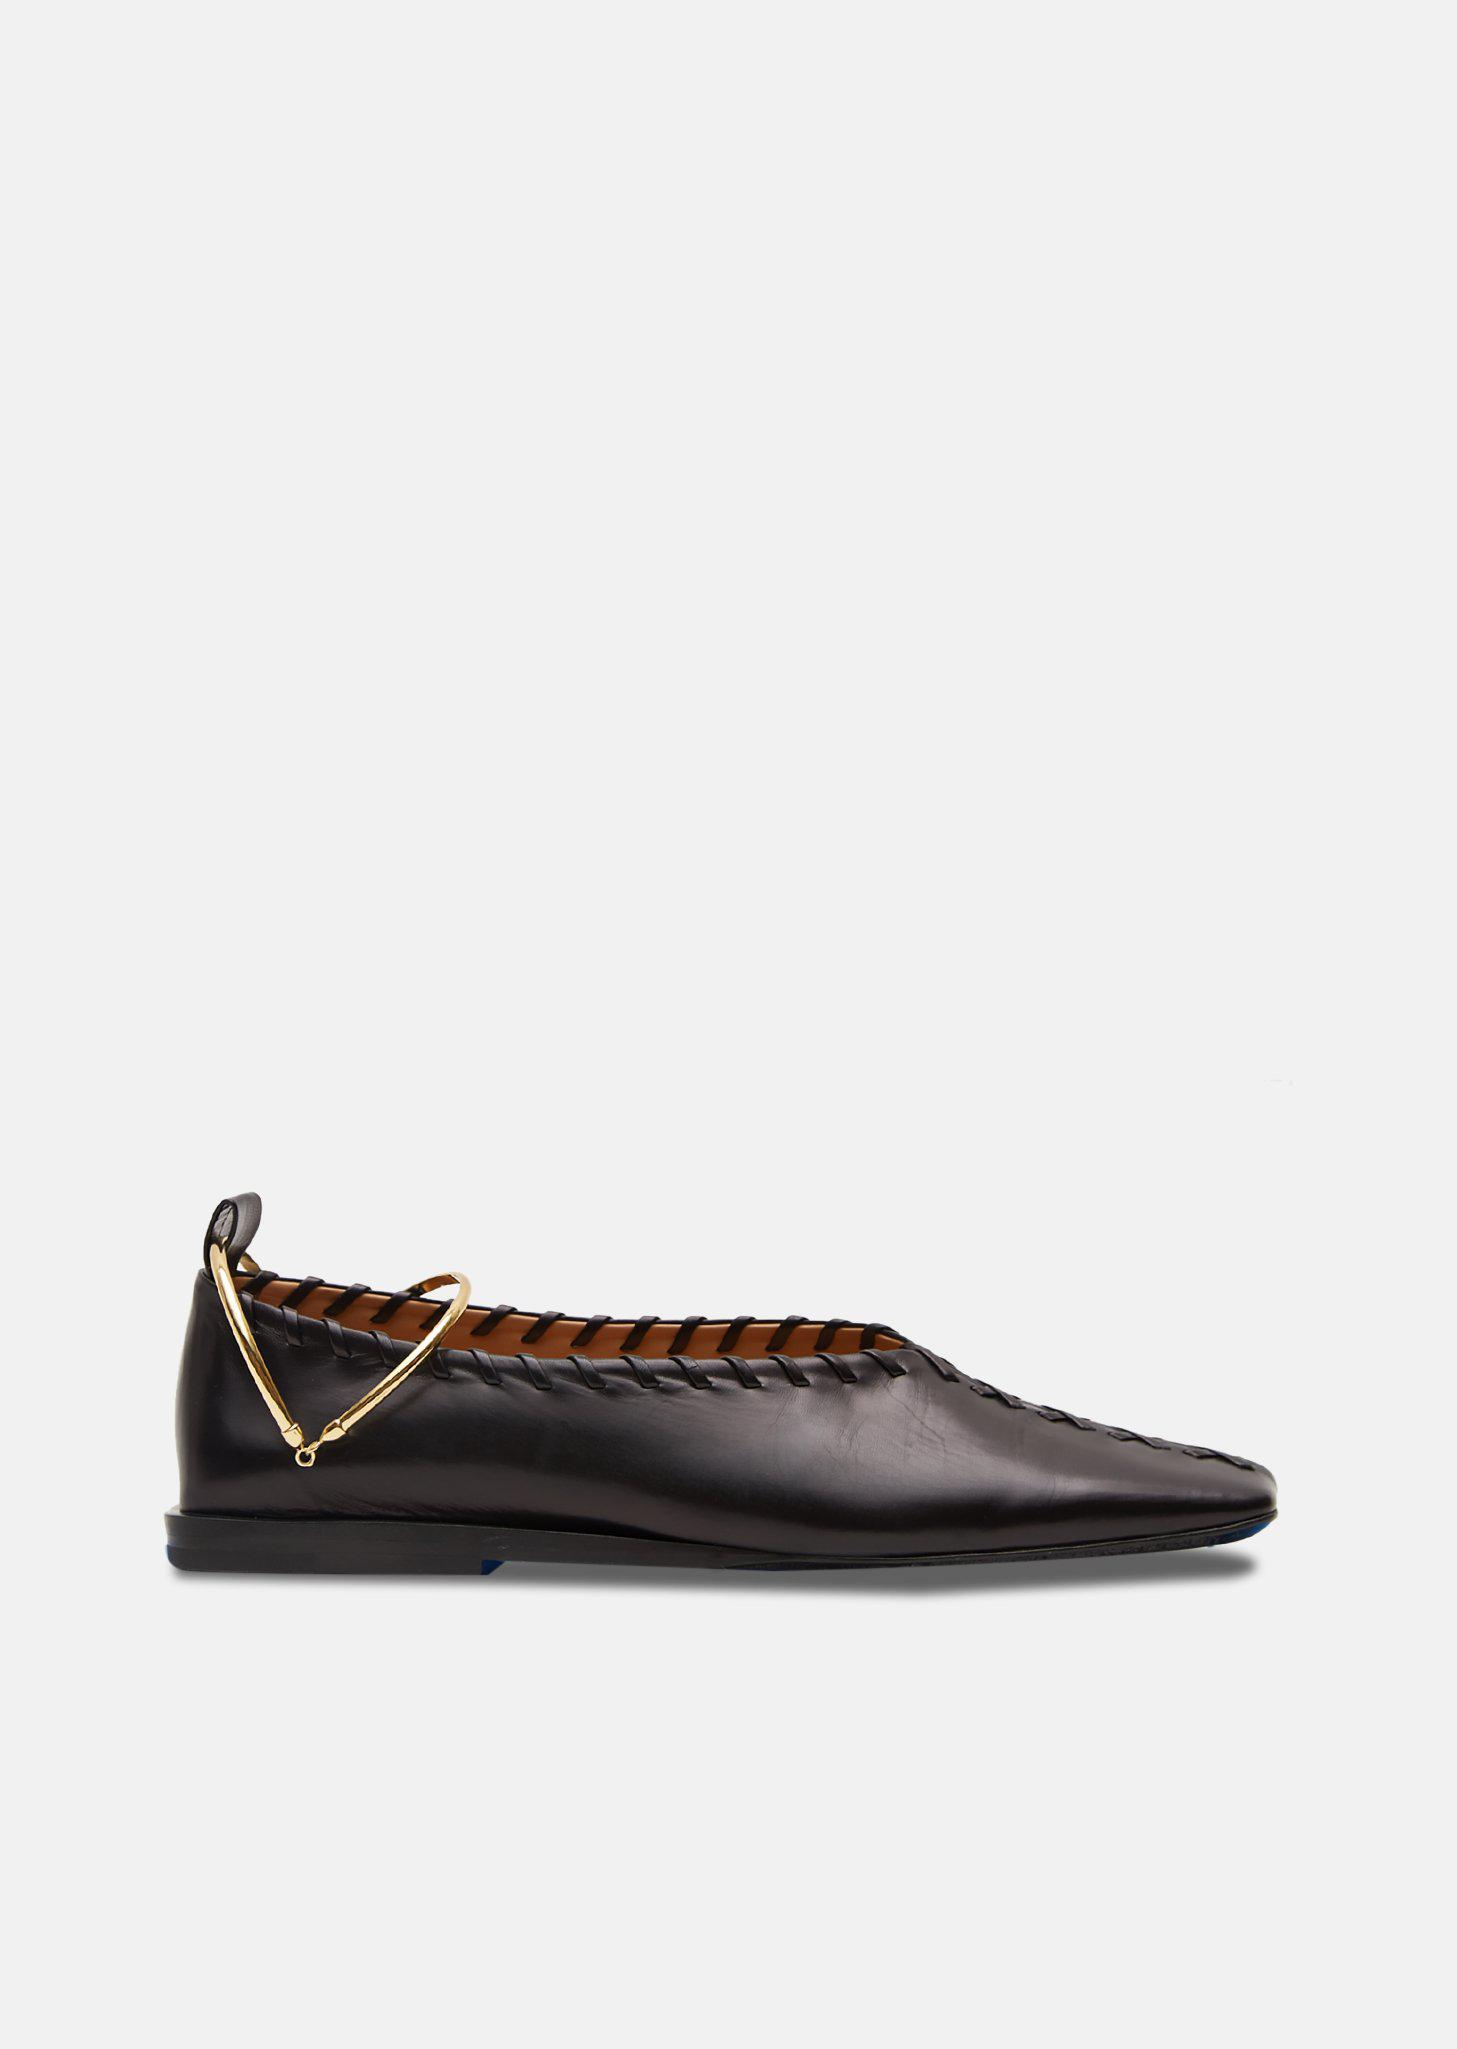 Jil Sander Patent Leather Flats